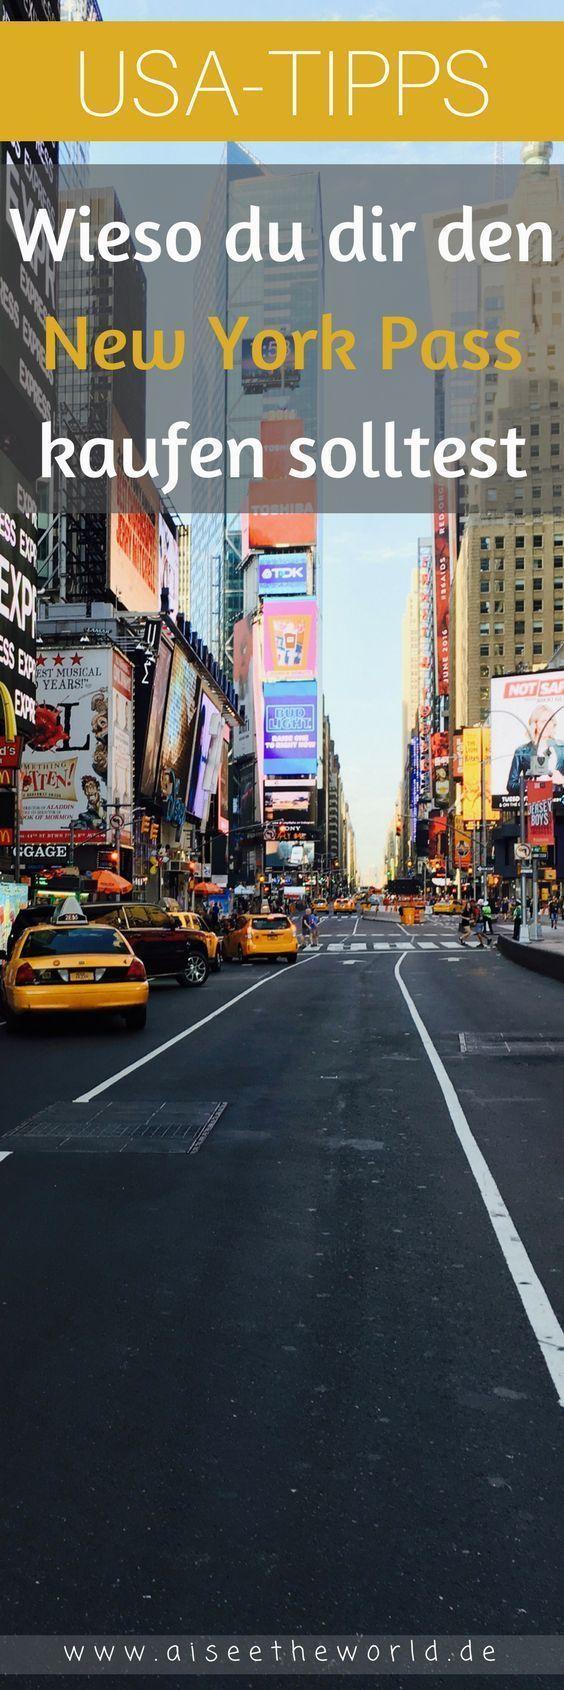 New York Pass: Wieso sich der New York Pass lohnt